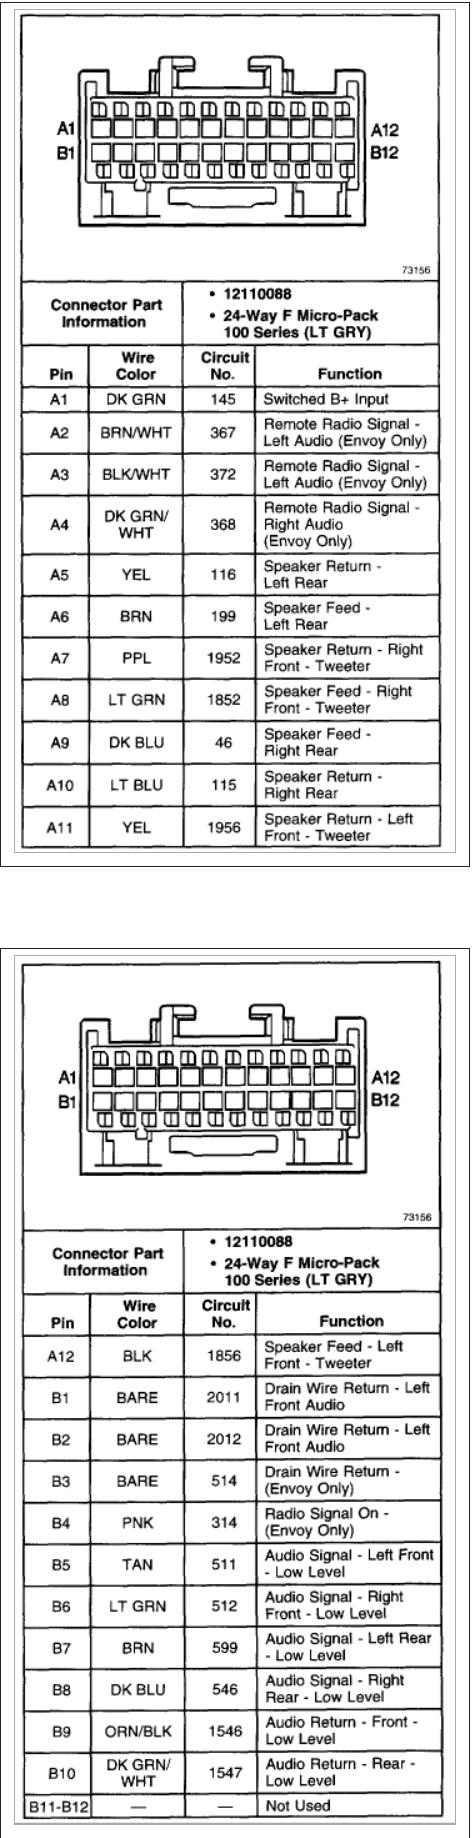 DIAGRAM] Gmc Envoy 2004 Wiring Diagram FULL Version HD Quality Wiring  Diagram - VEEDIAGRAMMING.SPANOBAR.IT | My Diagram Of 2003 Gmc Envoy Xlt Engine |  | Diagram Database